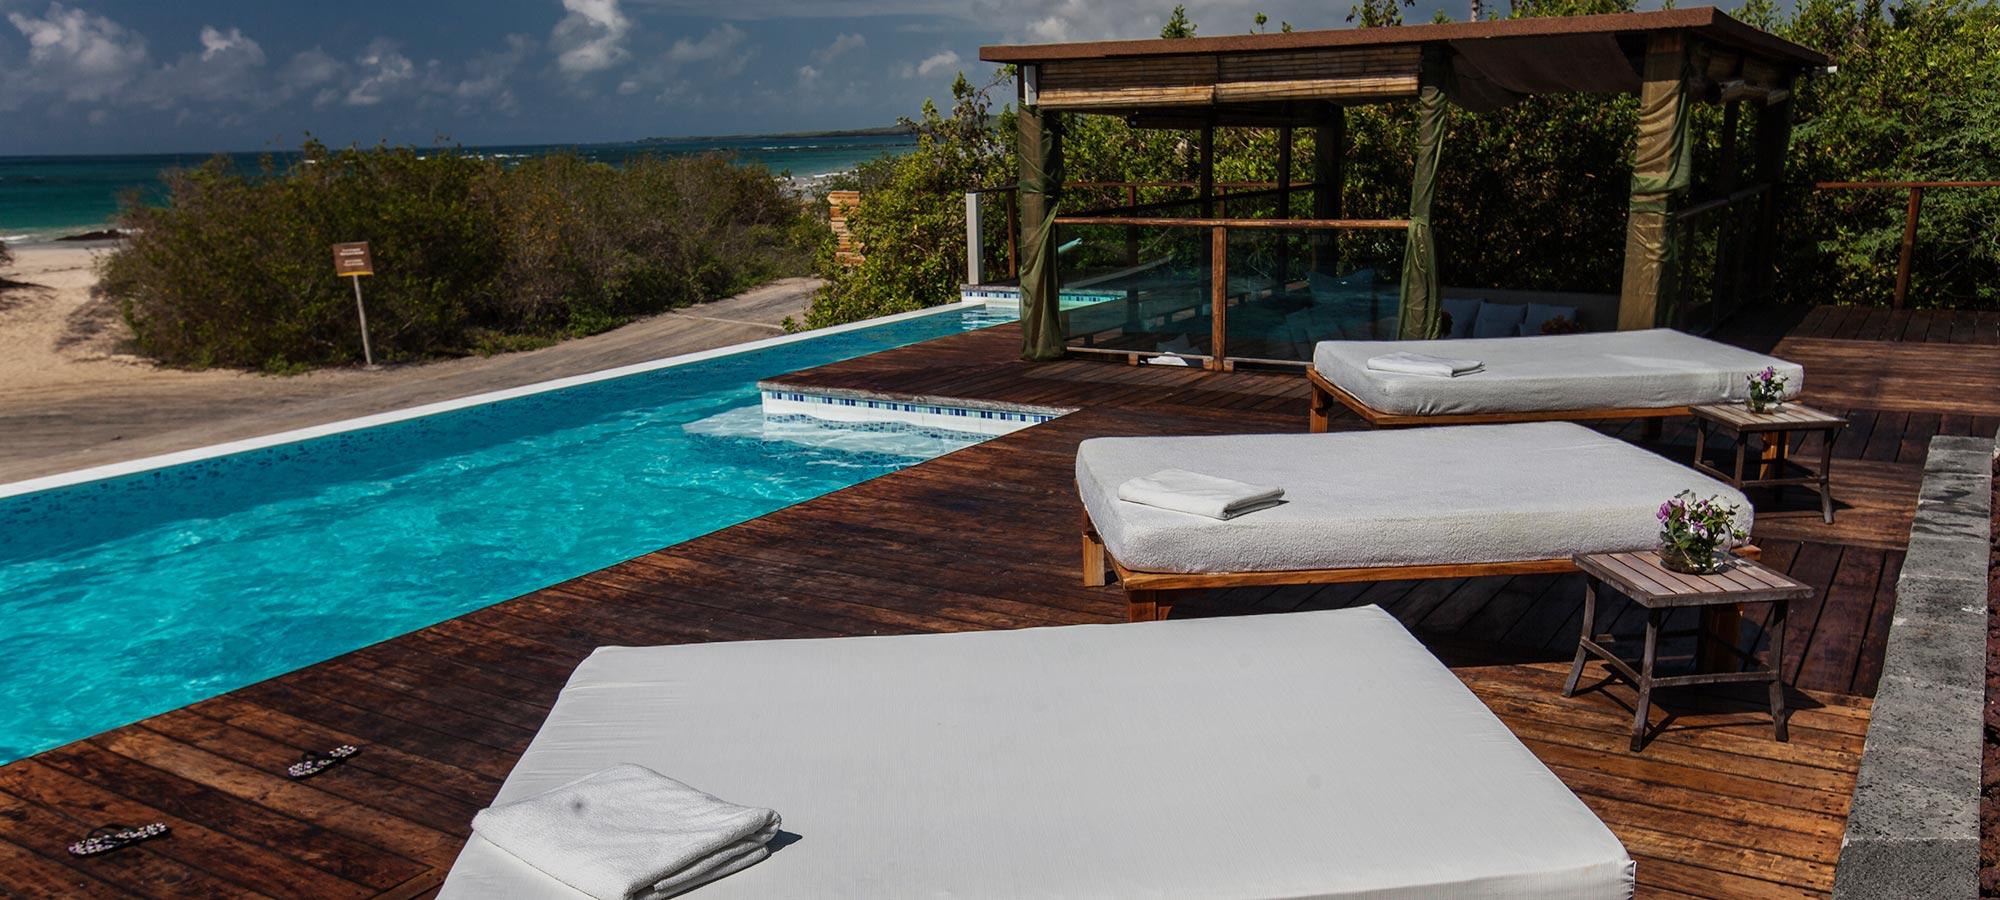 Opuntia-Galapagos-Hotels-home-1 Iguana Crossing - Isabela